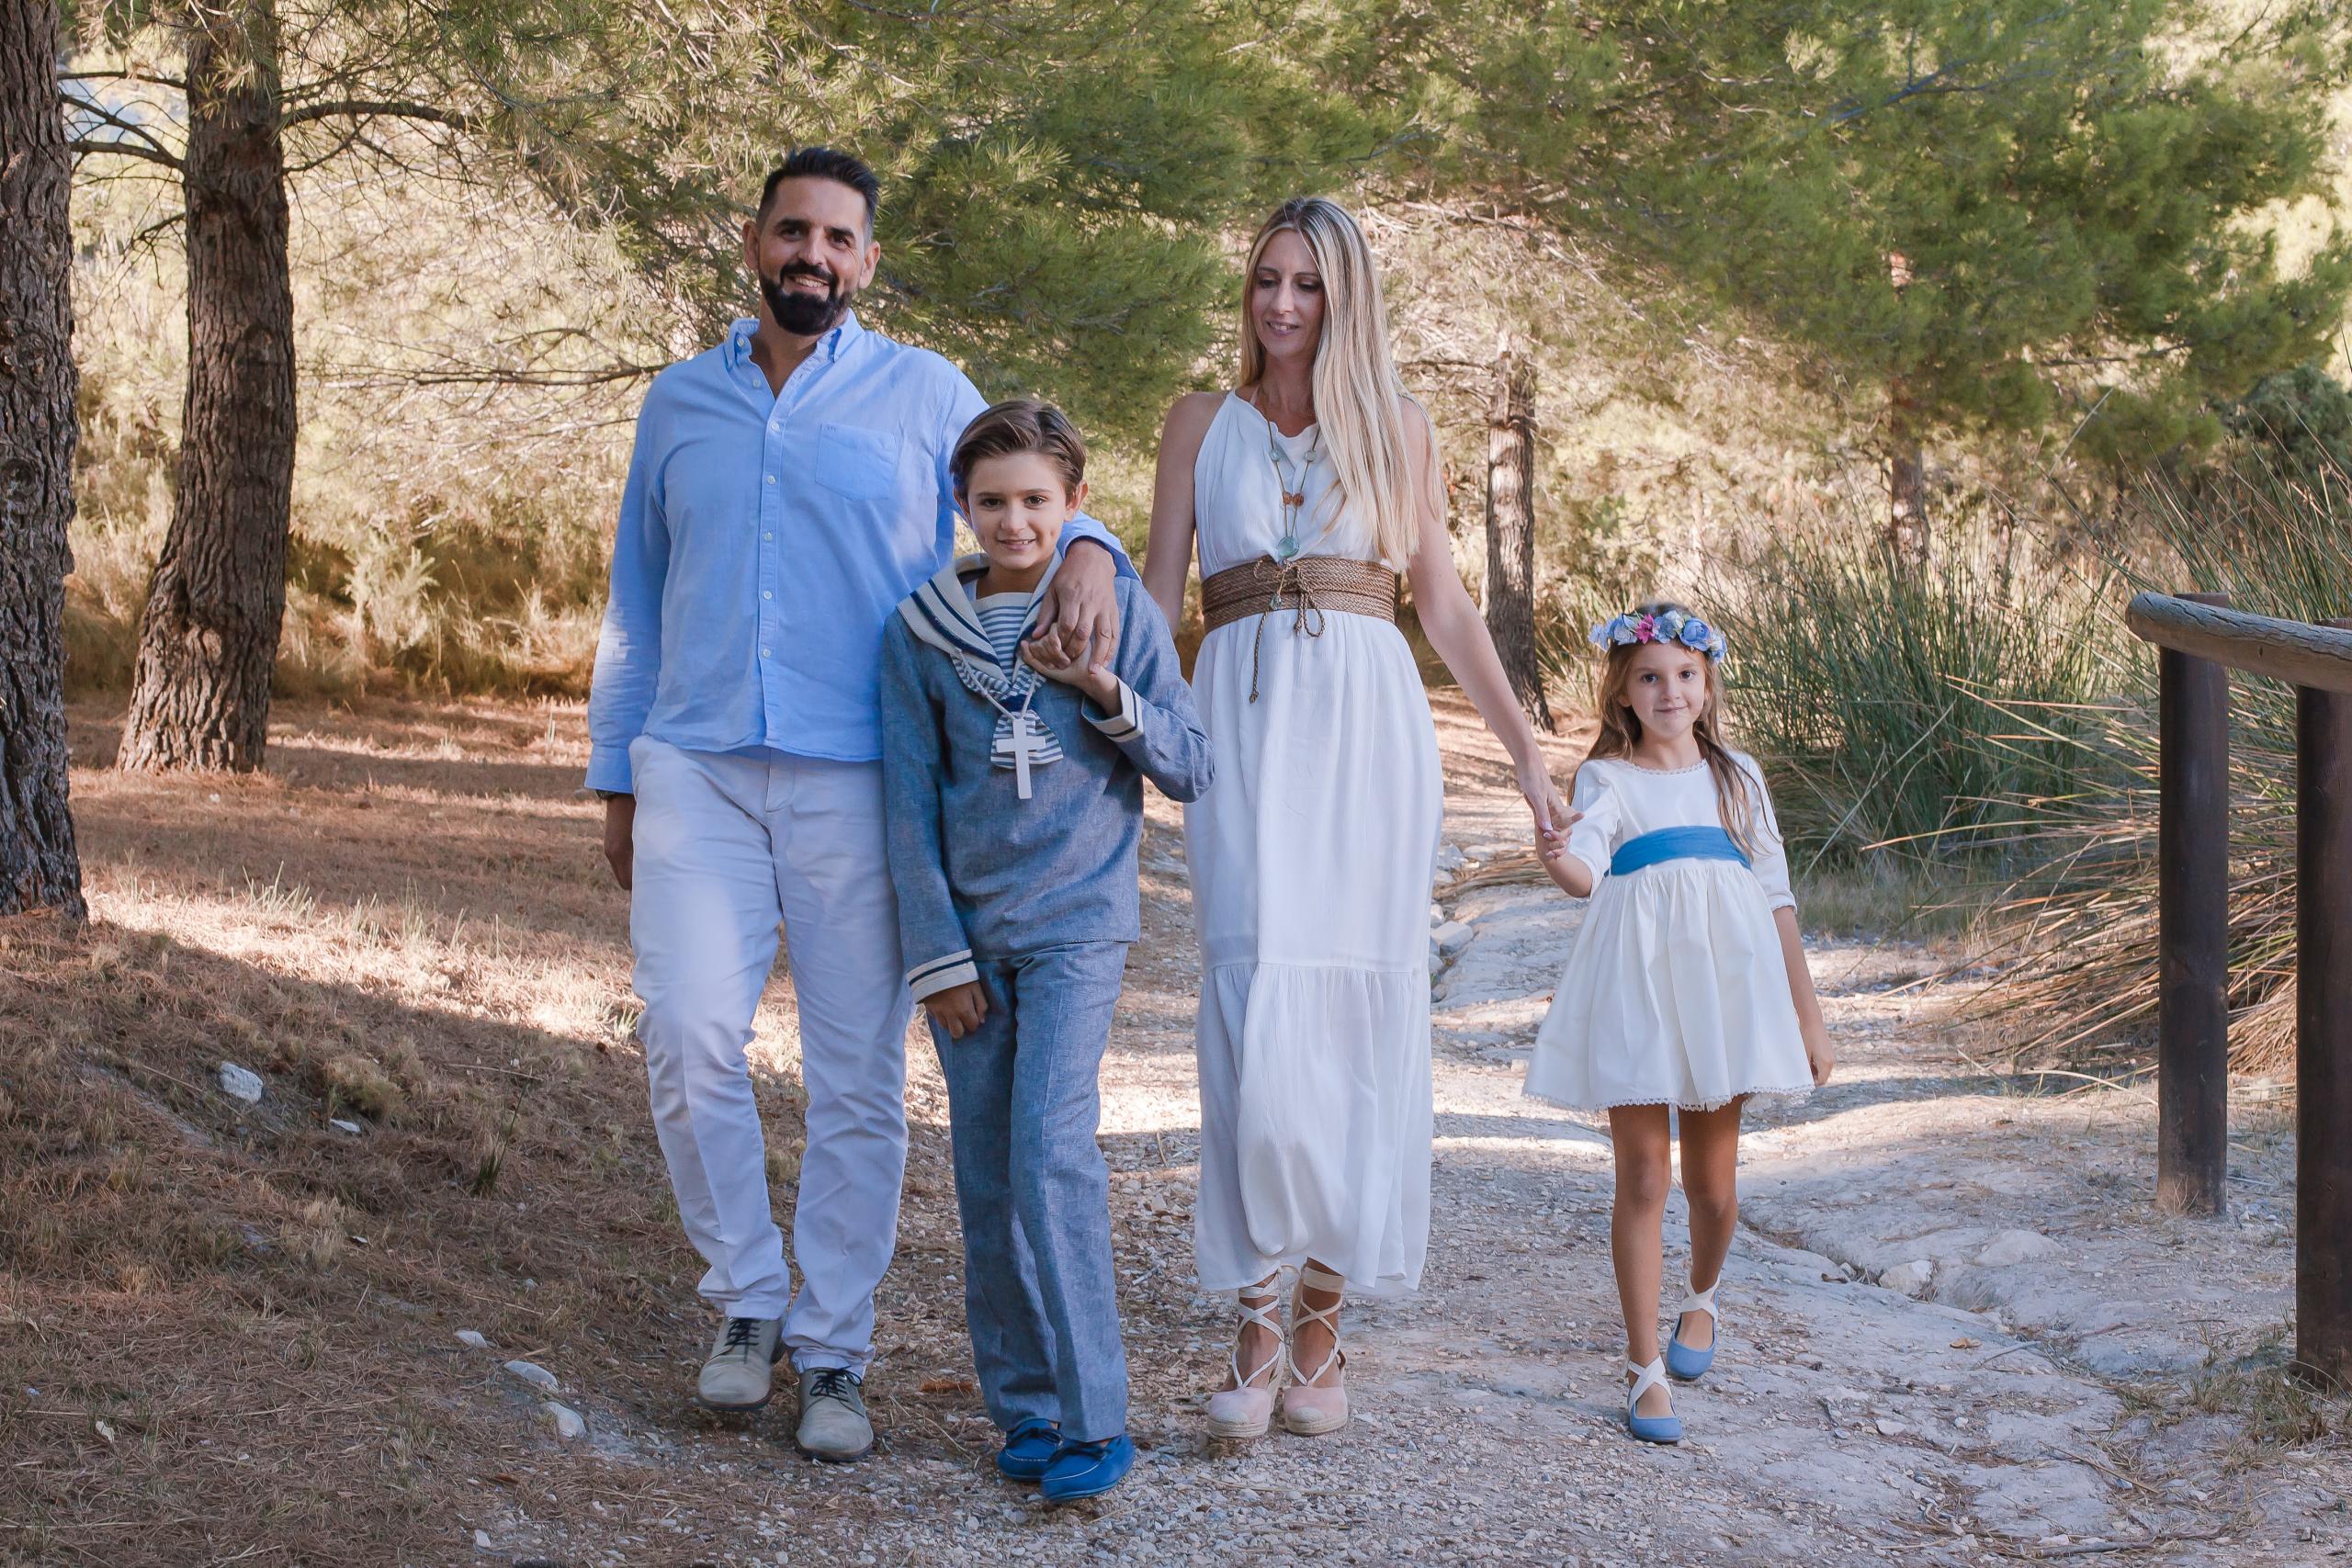 Fotos de comunión con familia